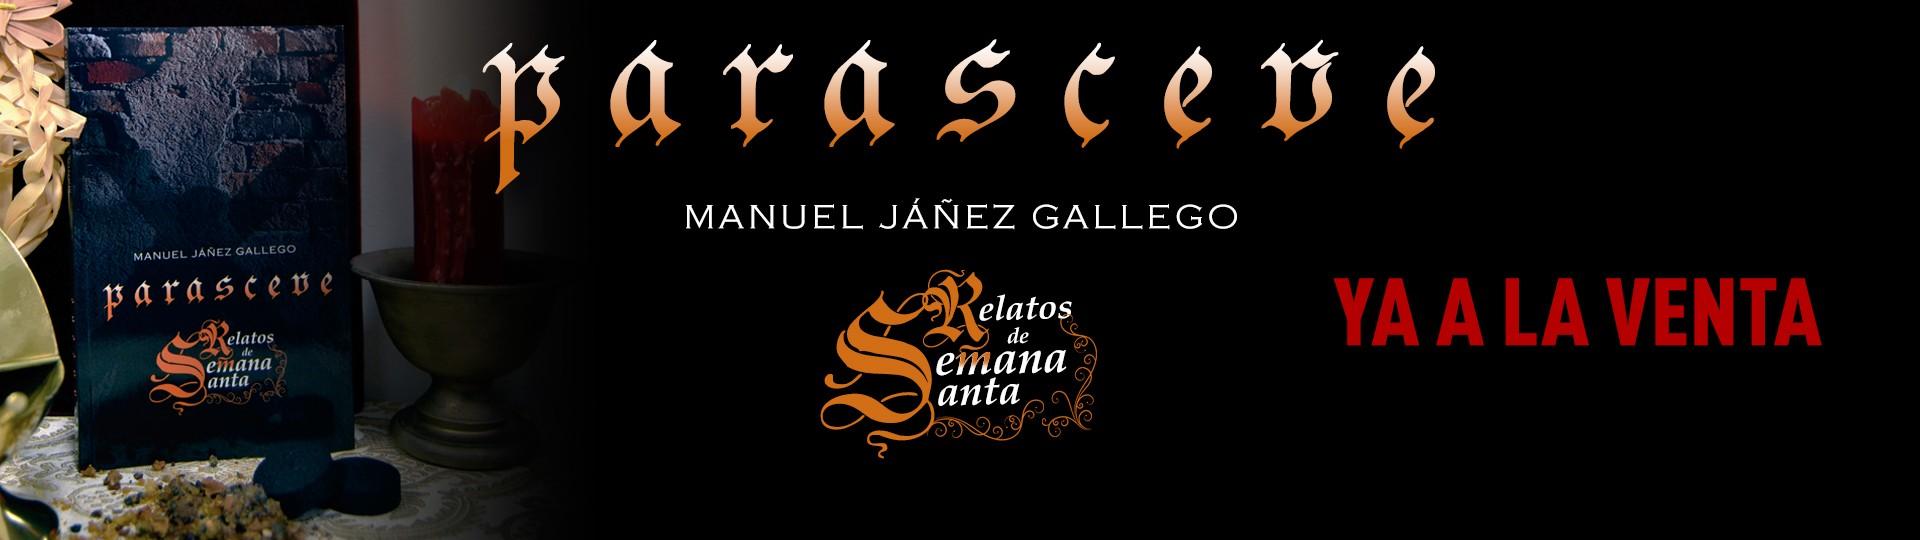 Parasceve, Relatos de Semana Santa de Manuel Jáñez